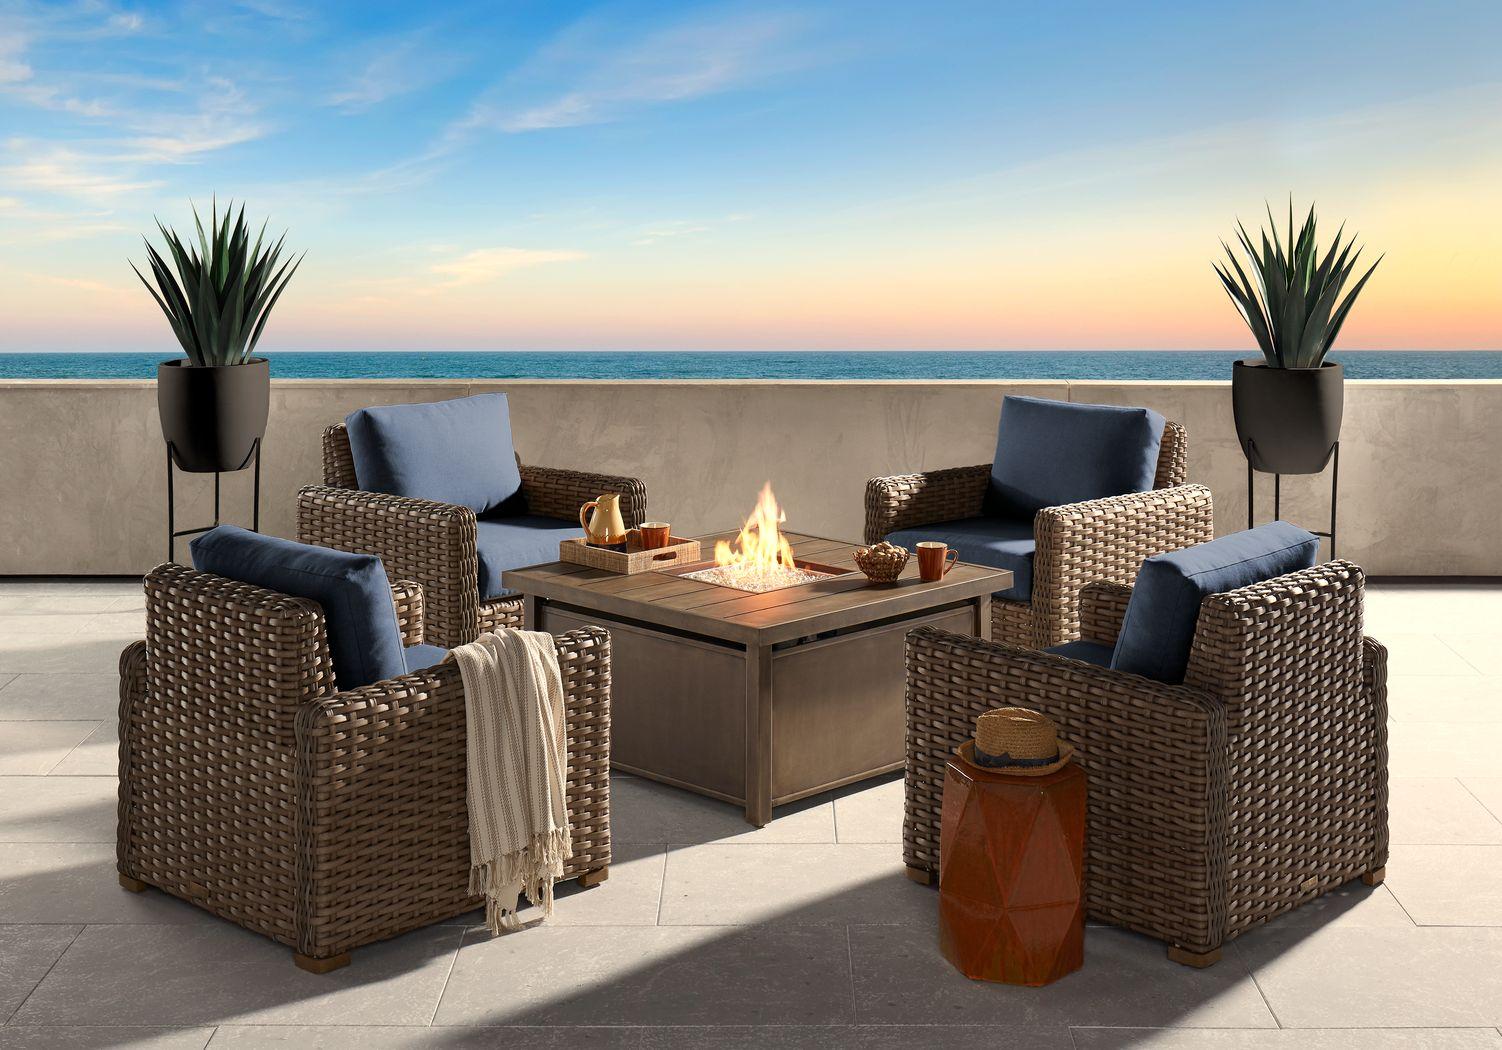 Siesta Key Driftwood 5 Pc Fire Pit Set with Indigo Cushions